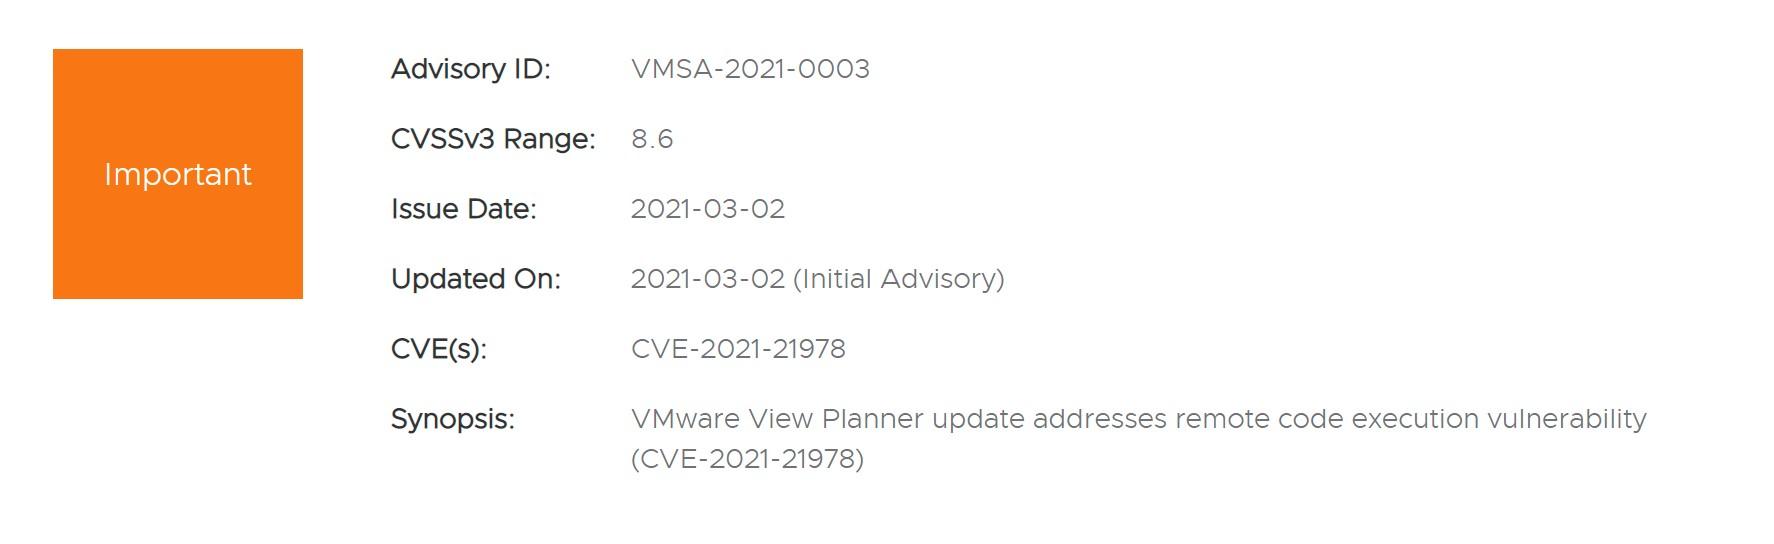 CVE-2021-21978: VMware View Planner Remote Code Execution Vulnerability Alert